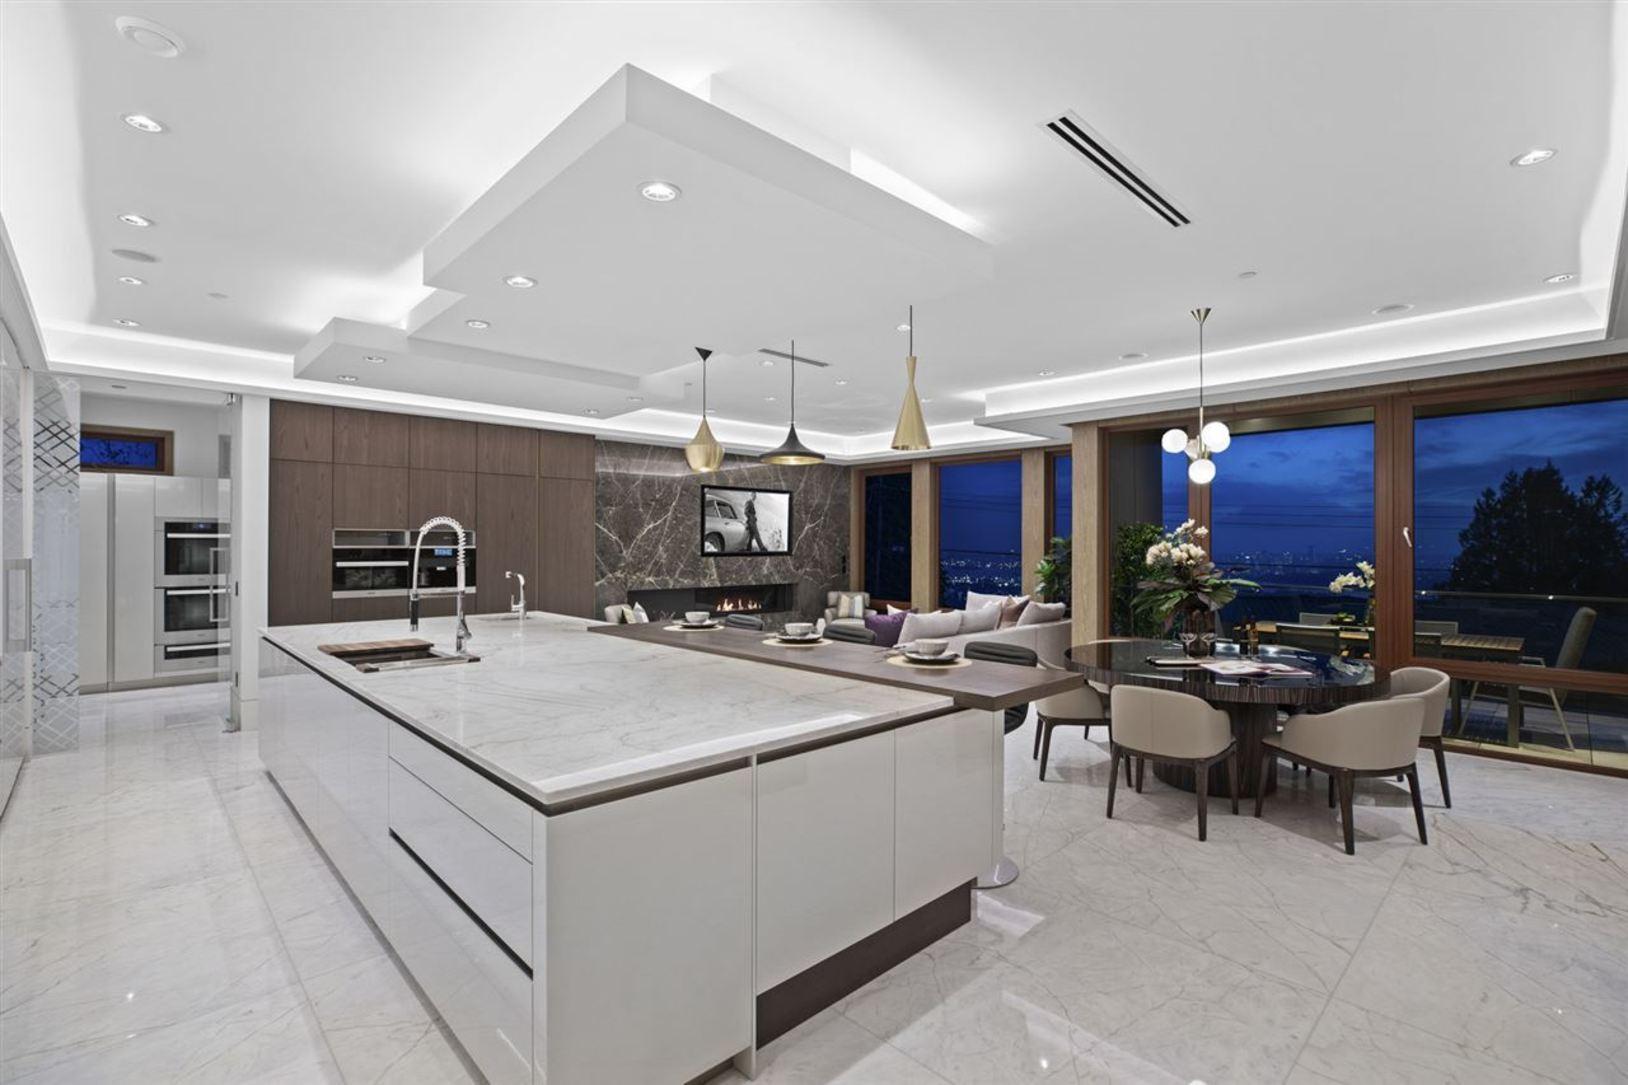 830-king-georges-way-british-properties-west-vancouver-09 at 830 King Georges Way, British Properties, West Vancouver